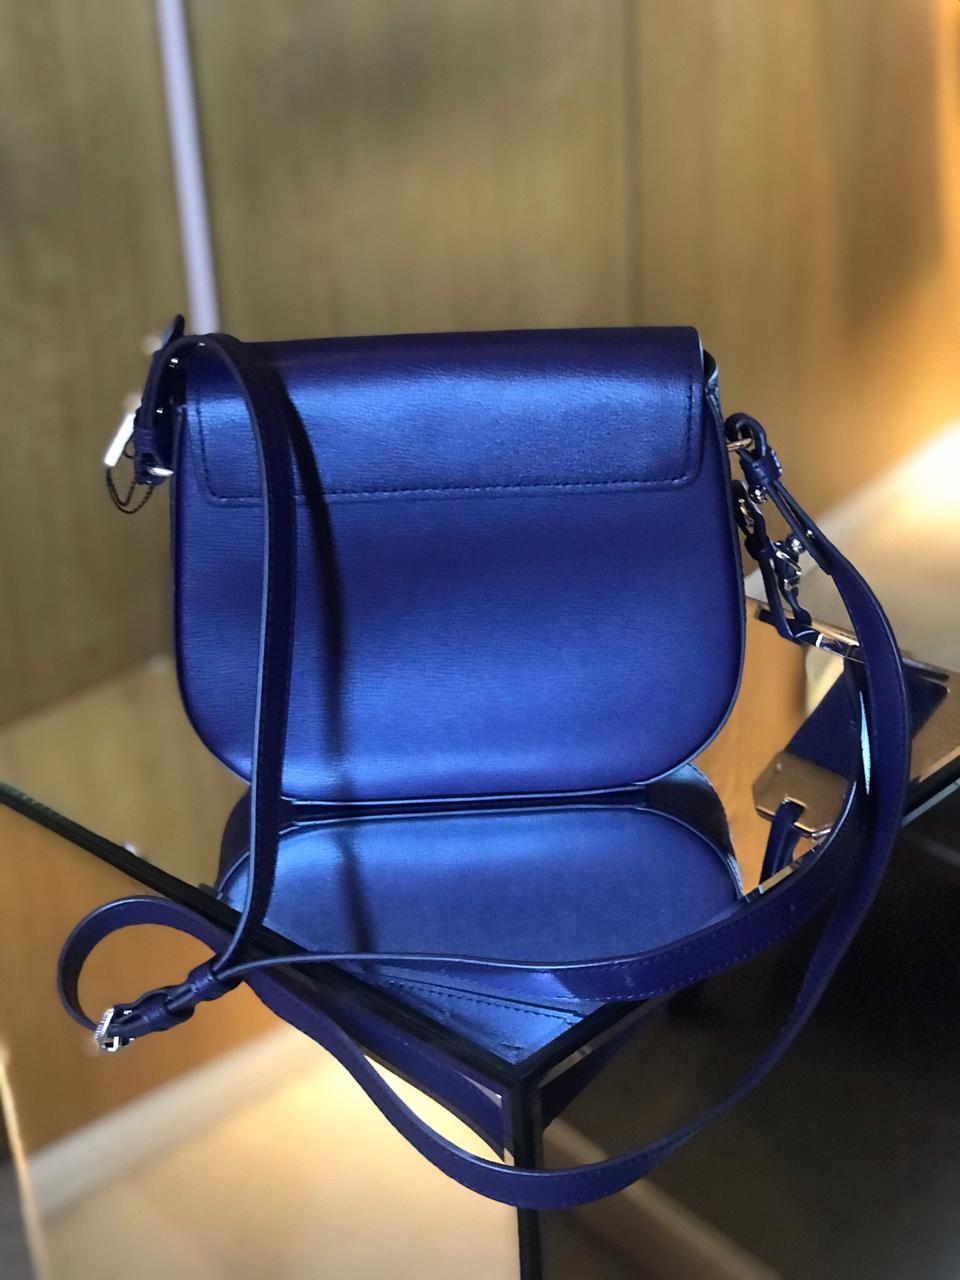 Bolsa Marc Jacobs Azul Marinho